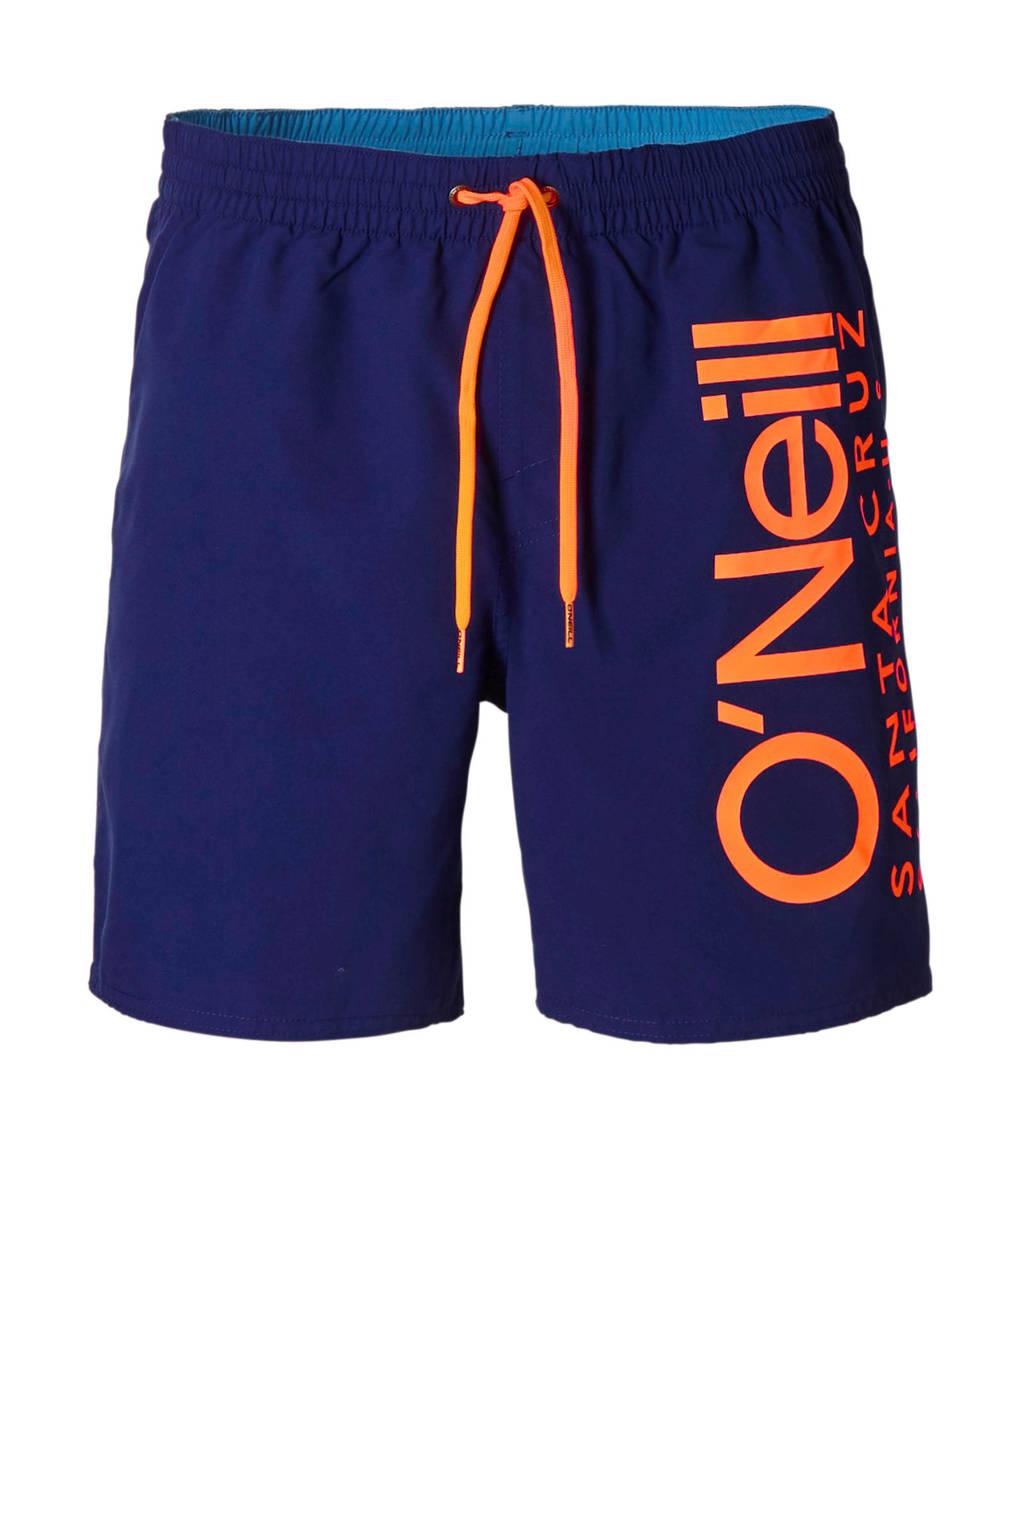 O'Neill zwemshort donkerblauw, Donkerblauw/oranje